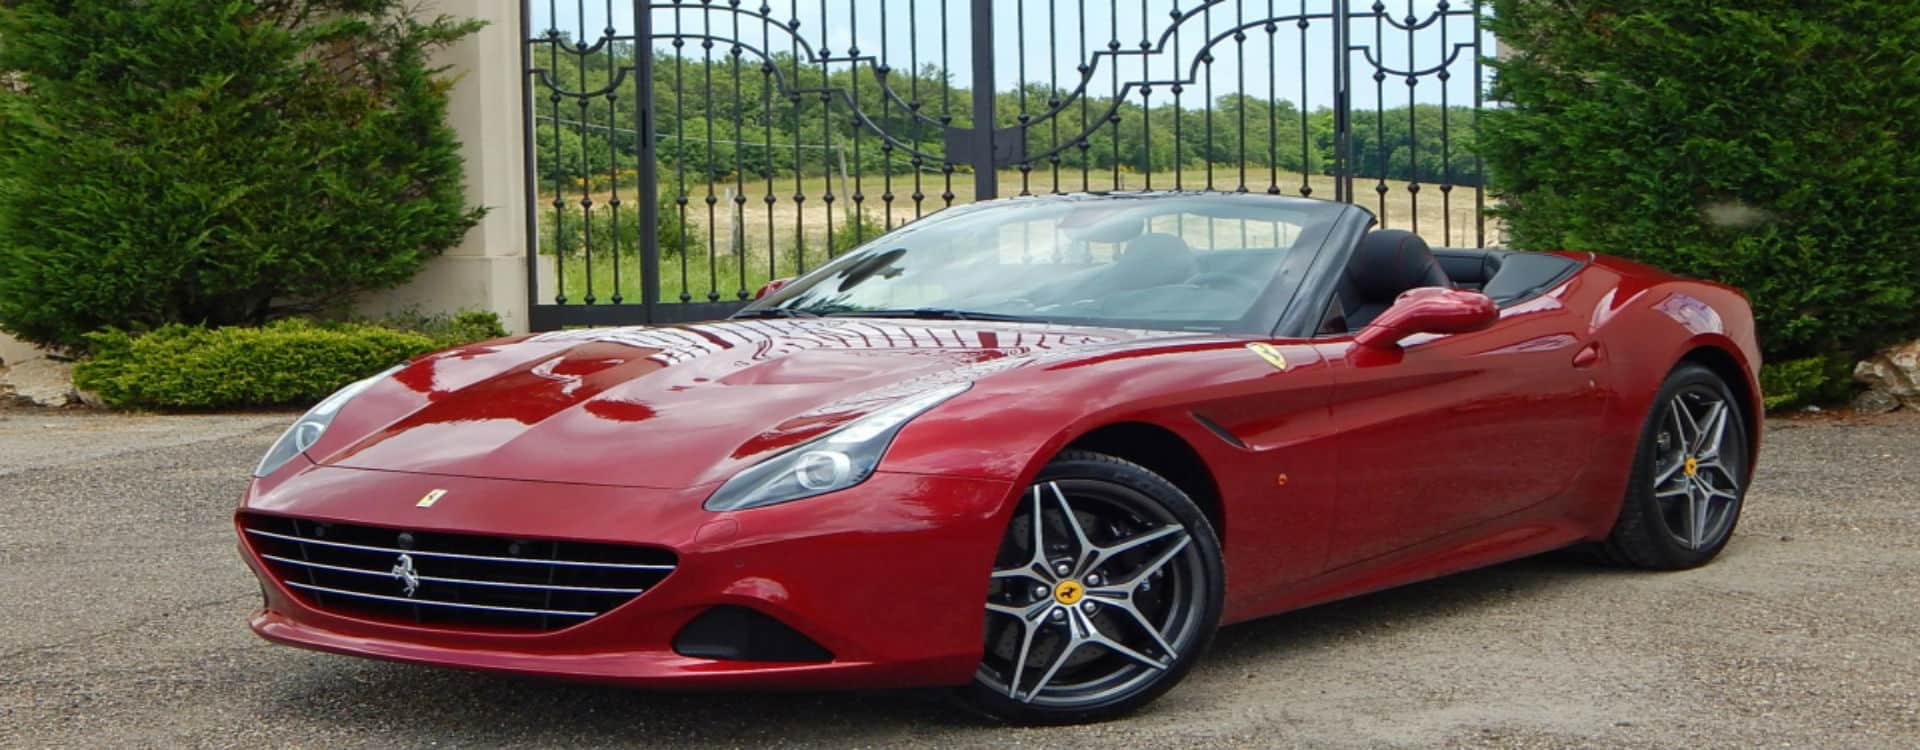 Tour Ferrari Roma